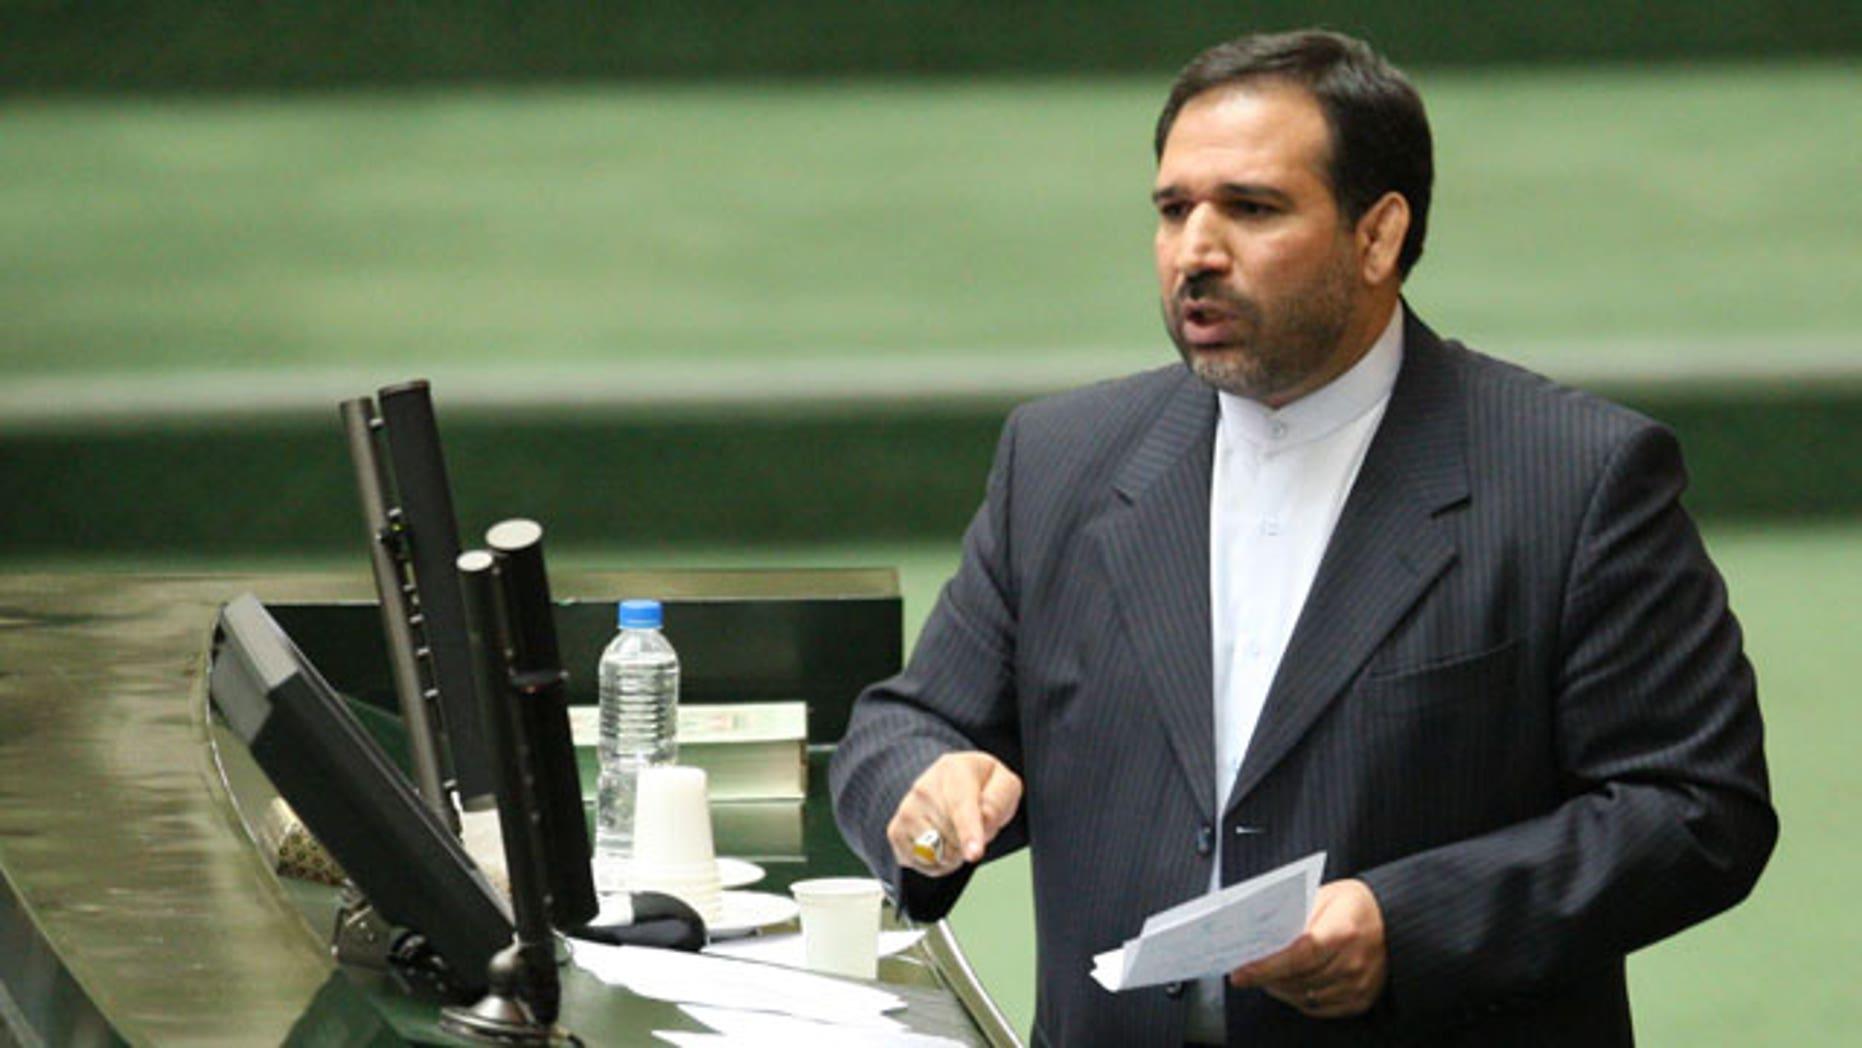 Nov. 1, 2011: Iran's Economy Minister, Shamsoddin Hosseini, speaks in an open session of parliament during his impeachment, in Tehran, Iran.